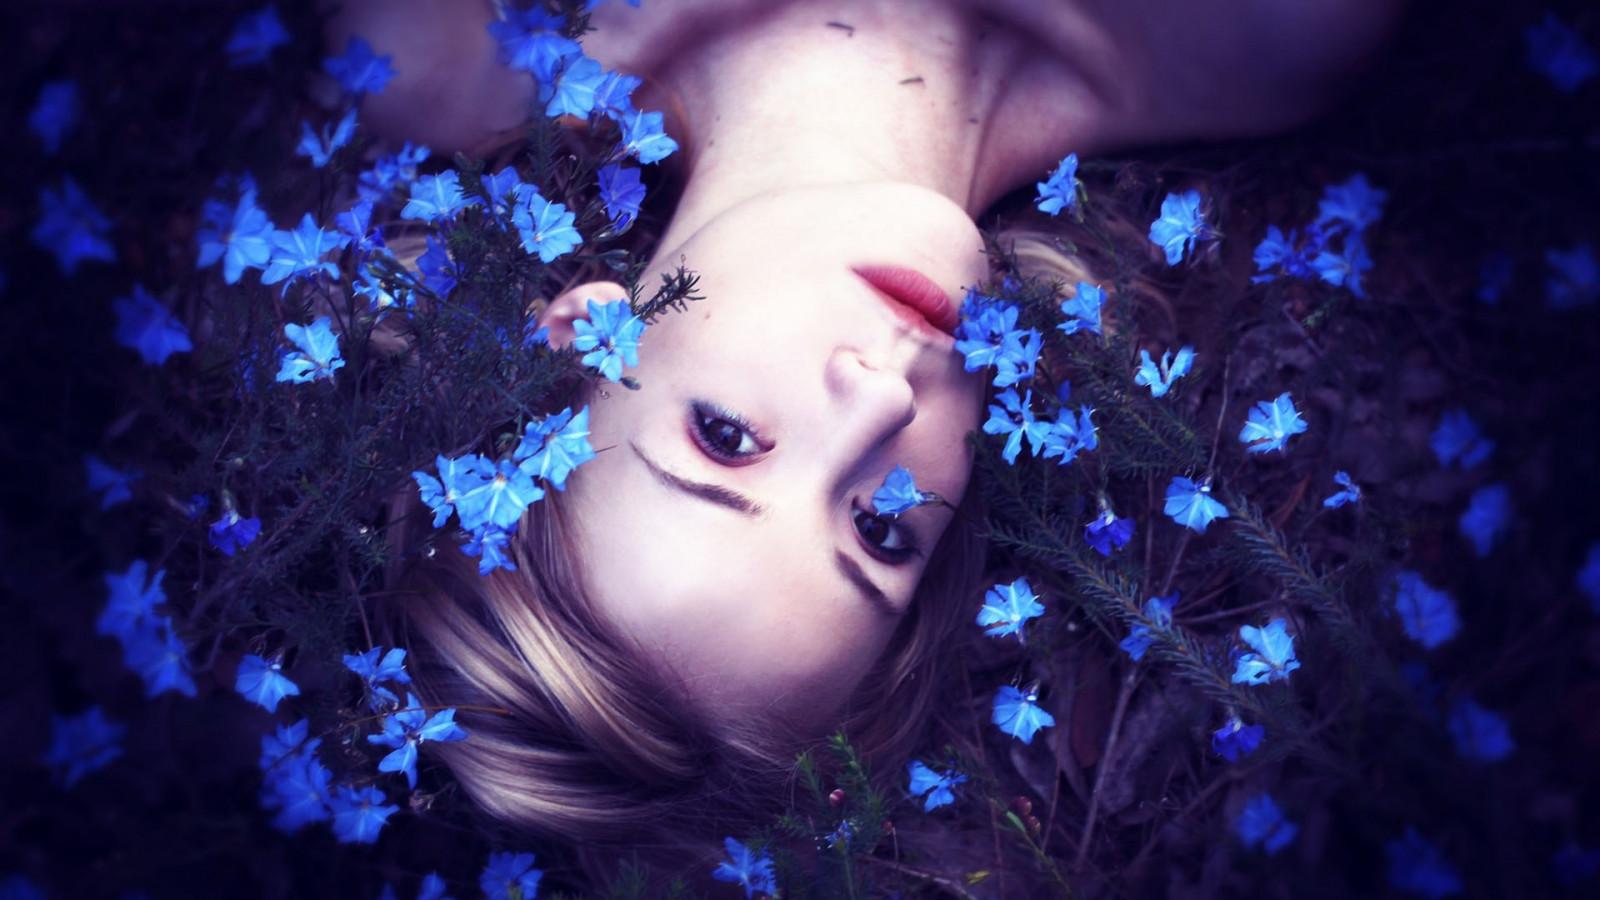 Blue photos of girls